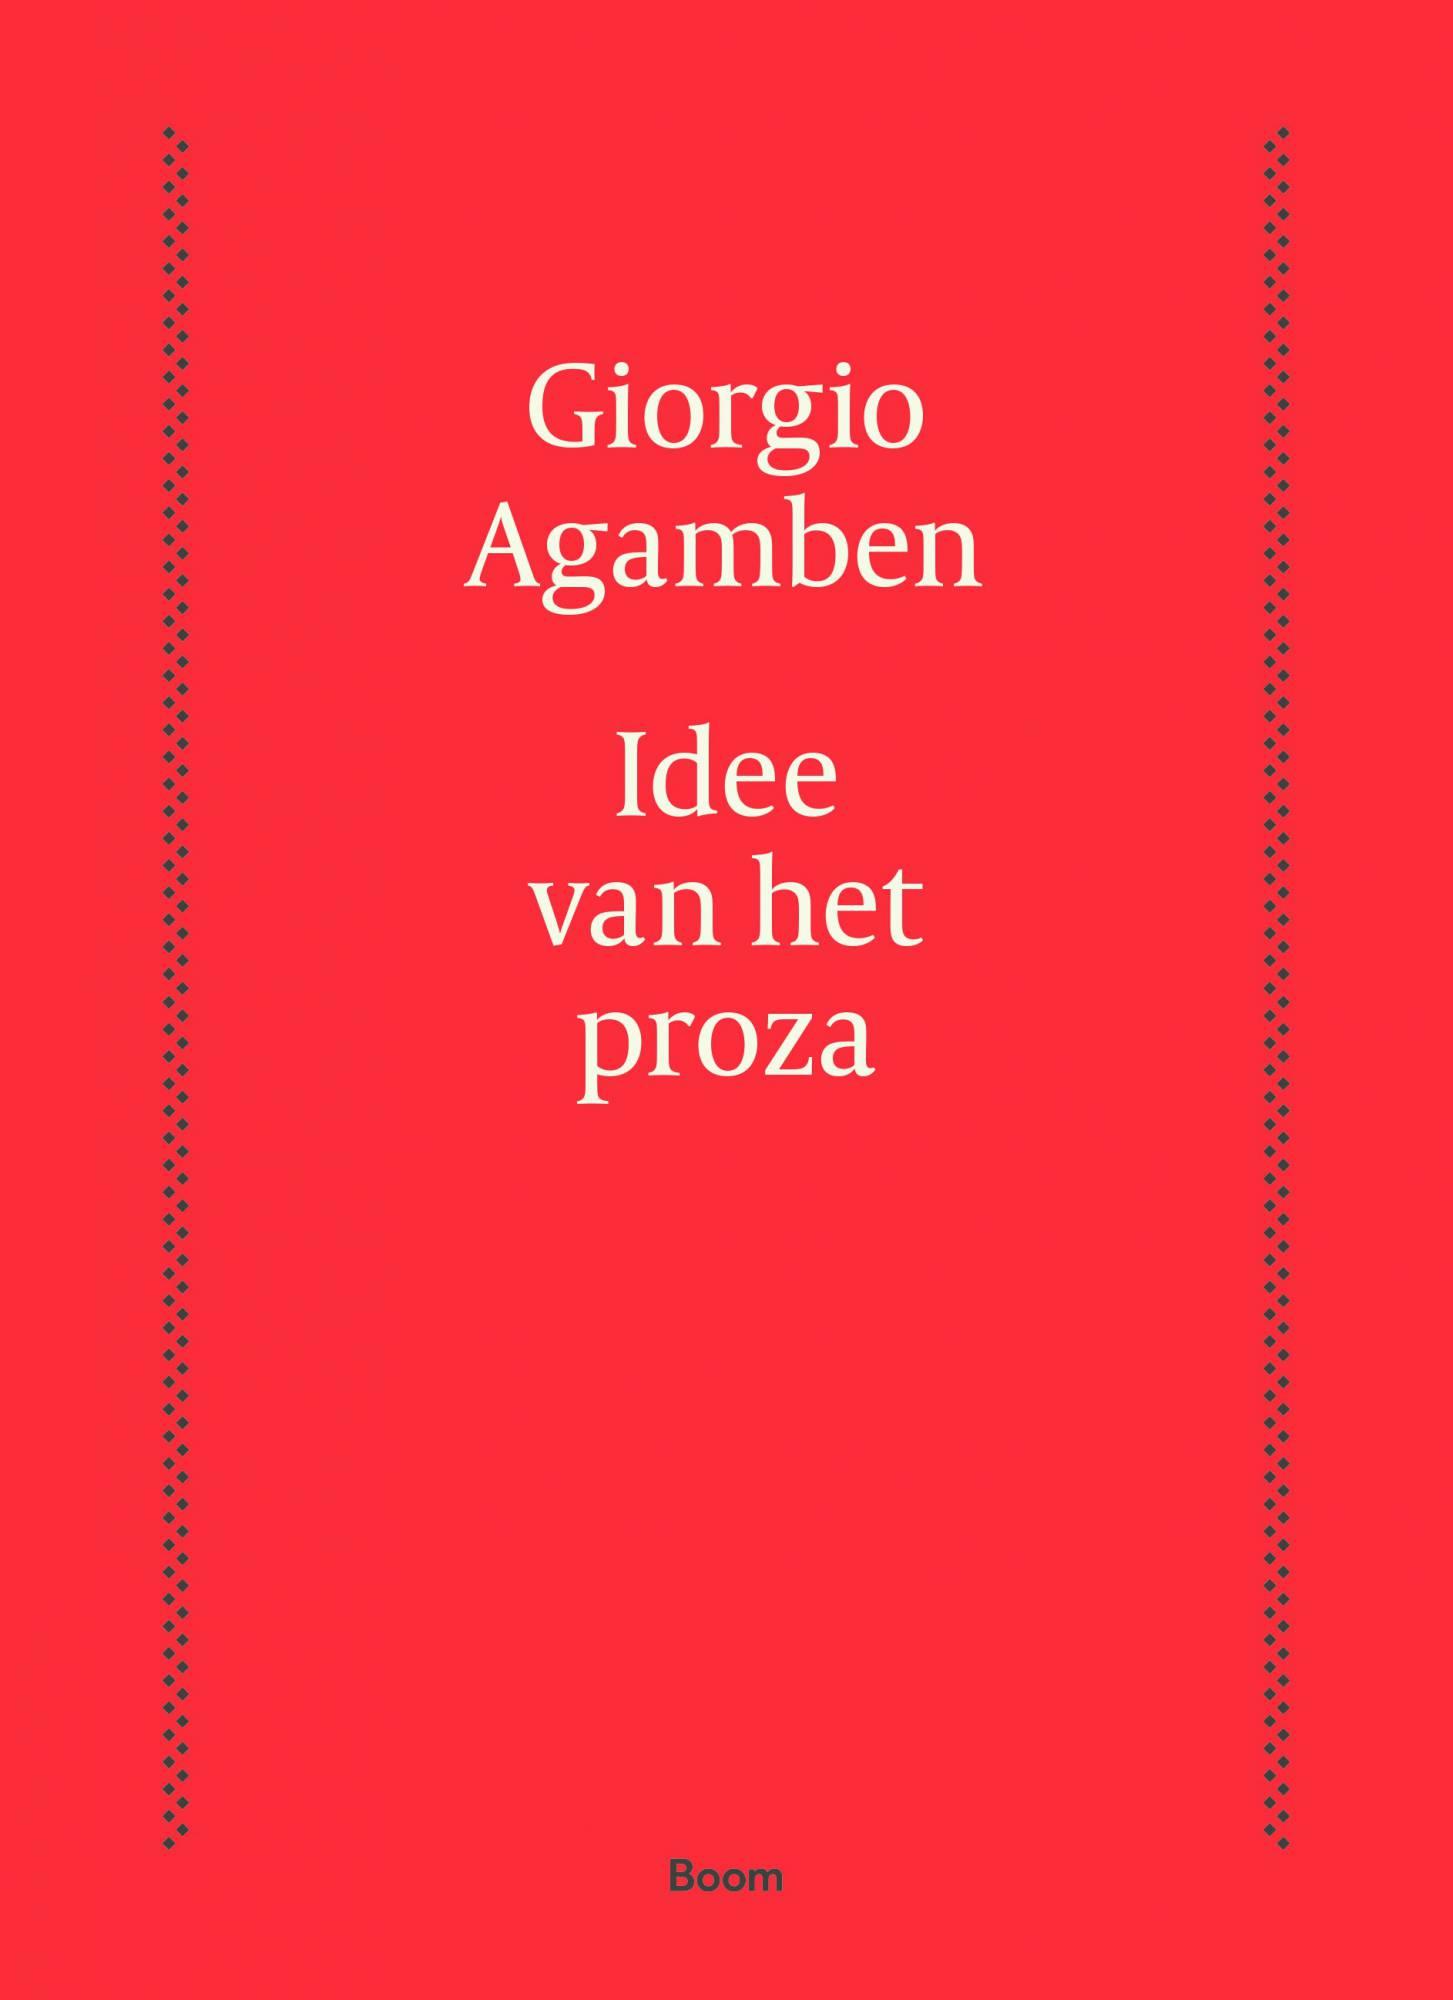 agamben2